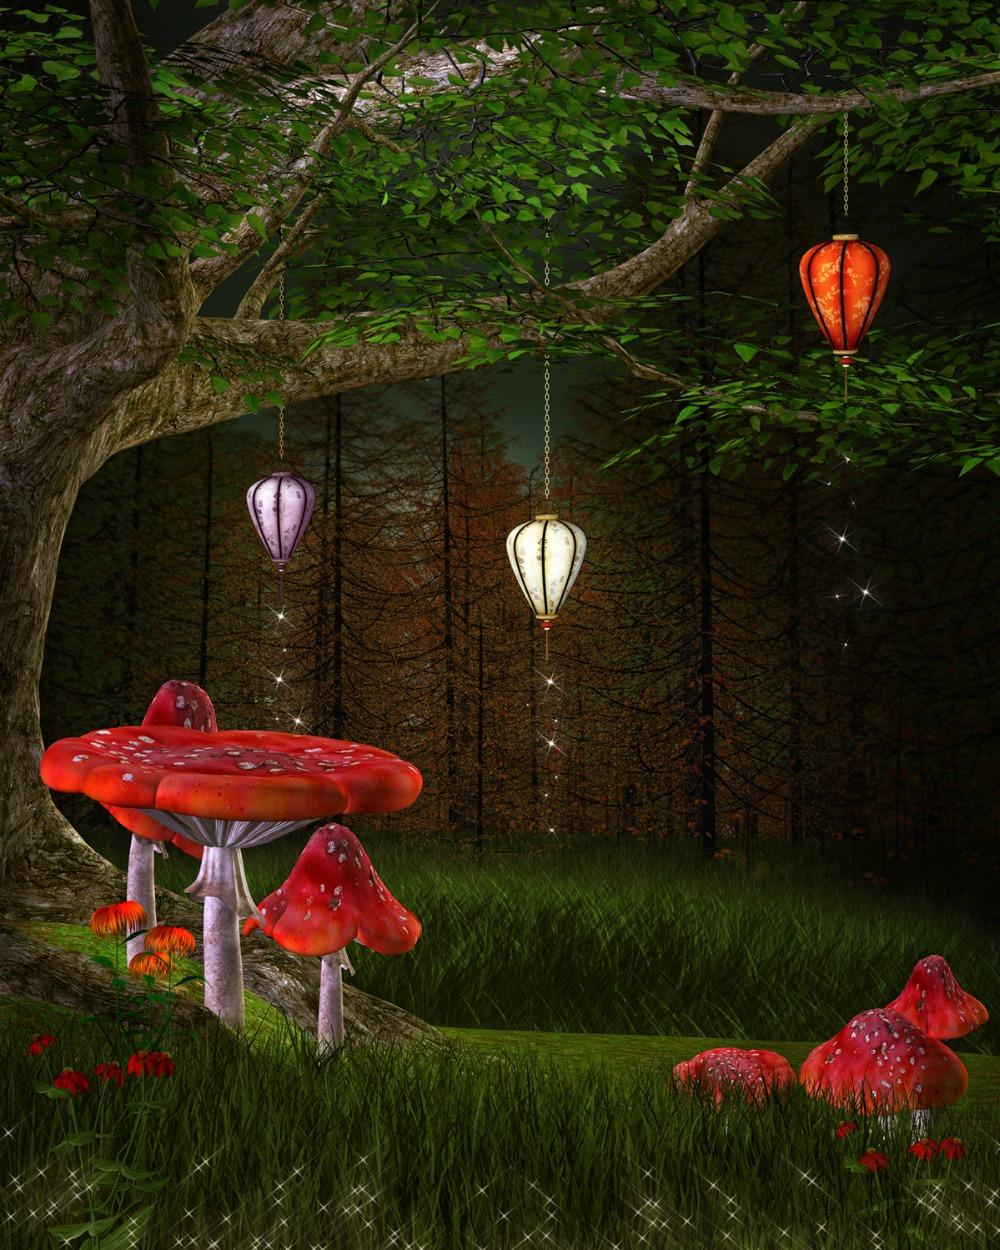 enchanted mushroom wallpaper - photo #20